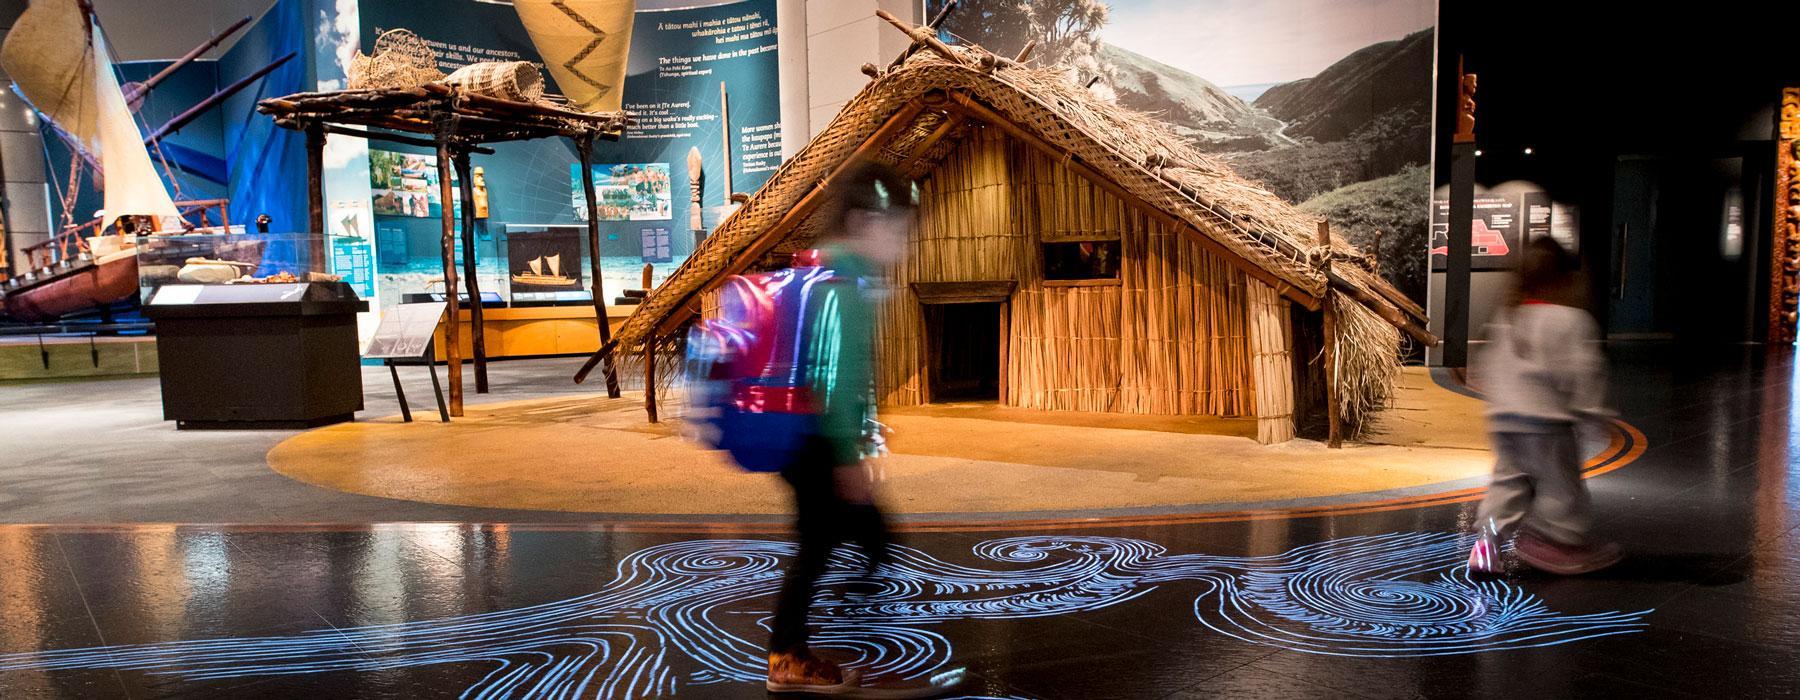 Inside the Mana Whenua exhibition